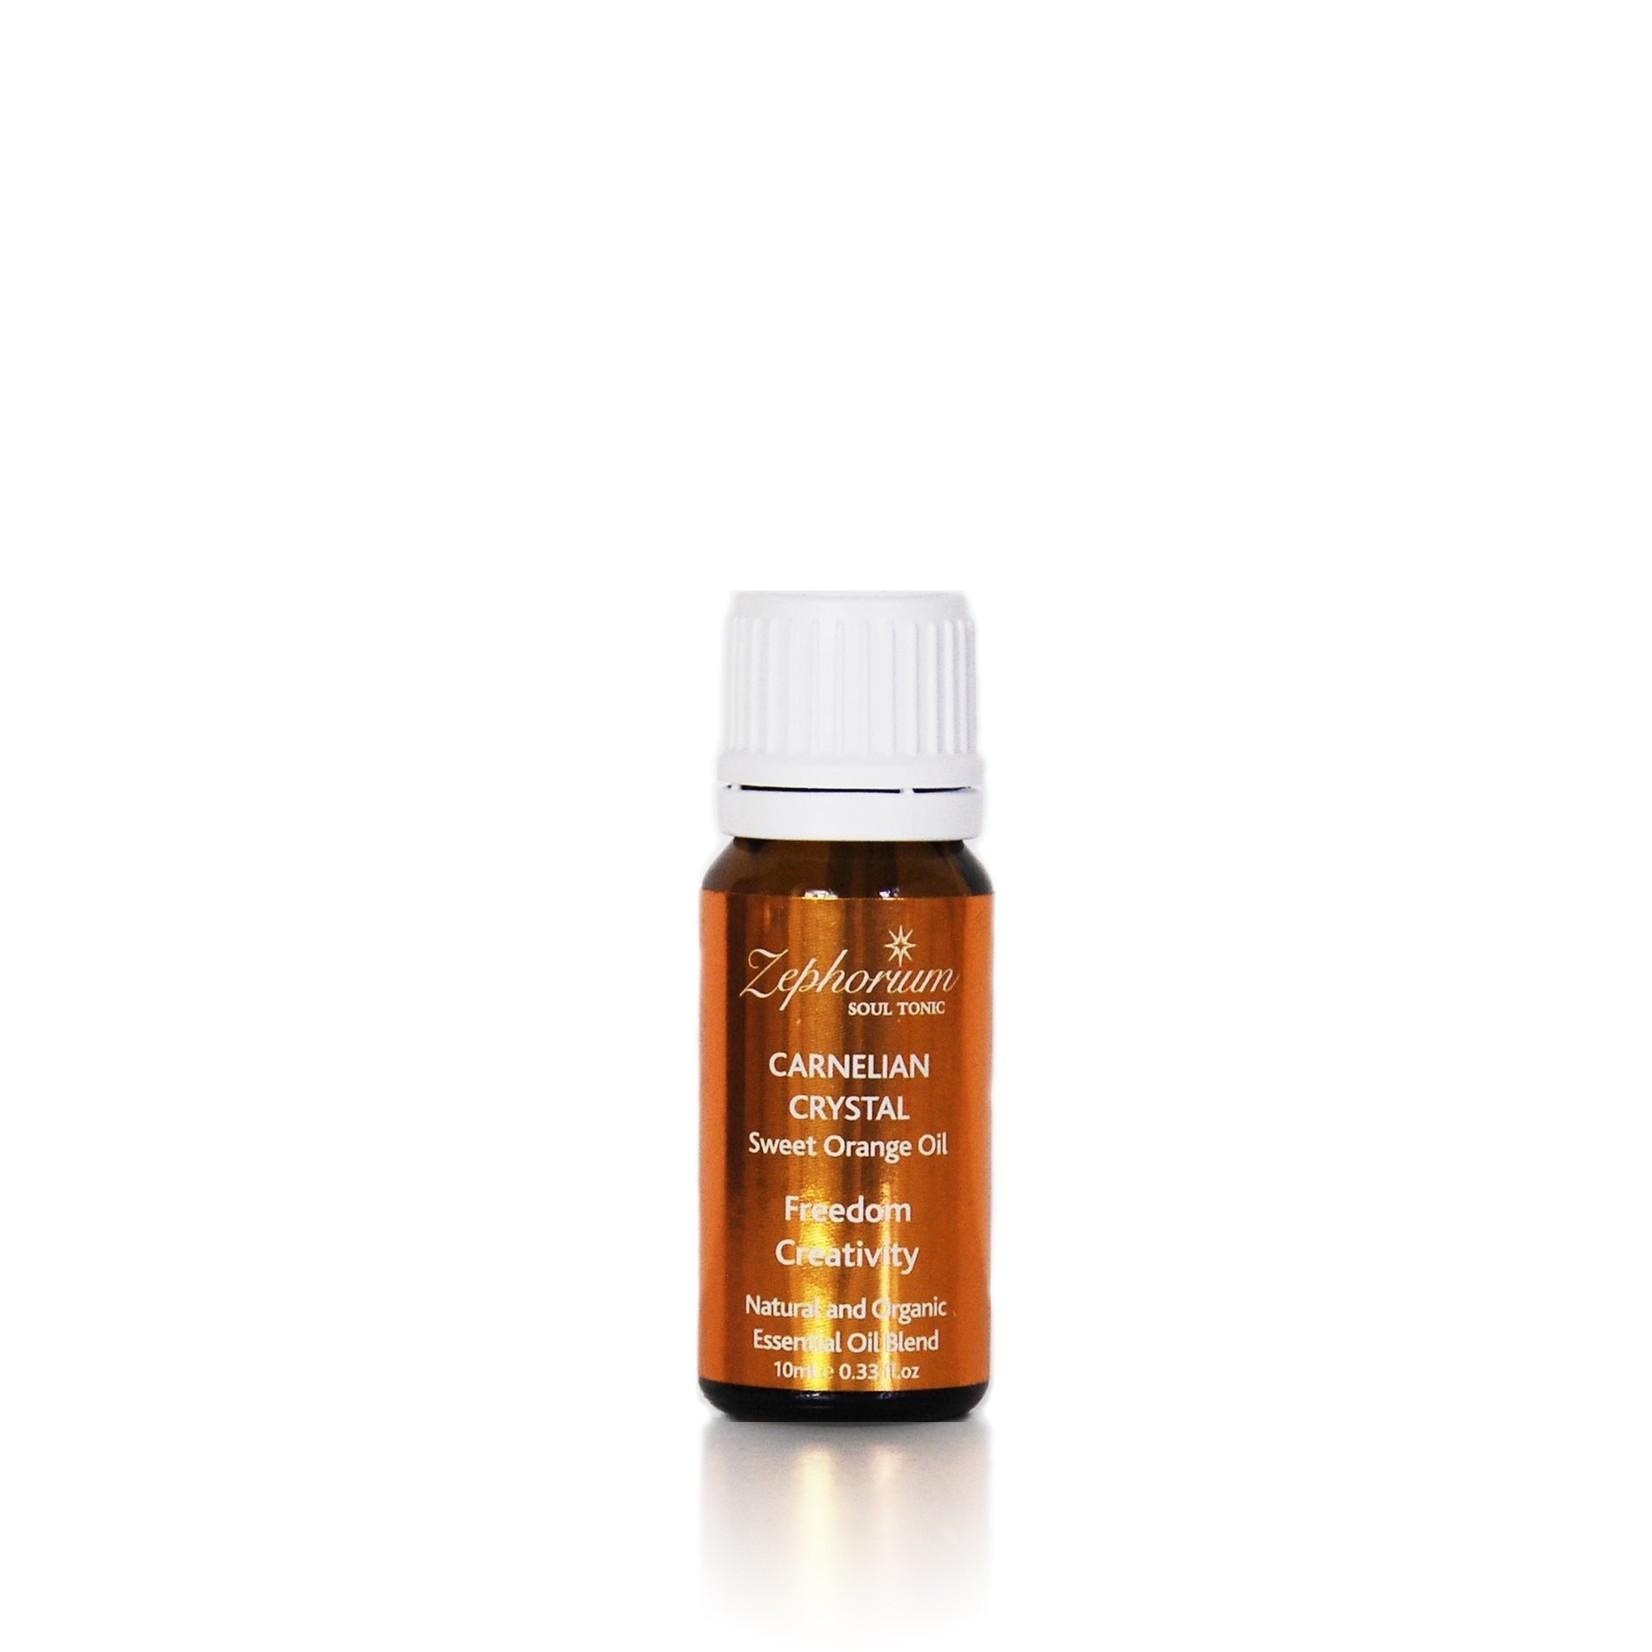 Zephorium Carnelian essential oil blend - sacraal chakra